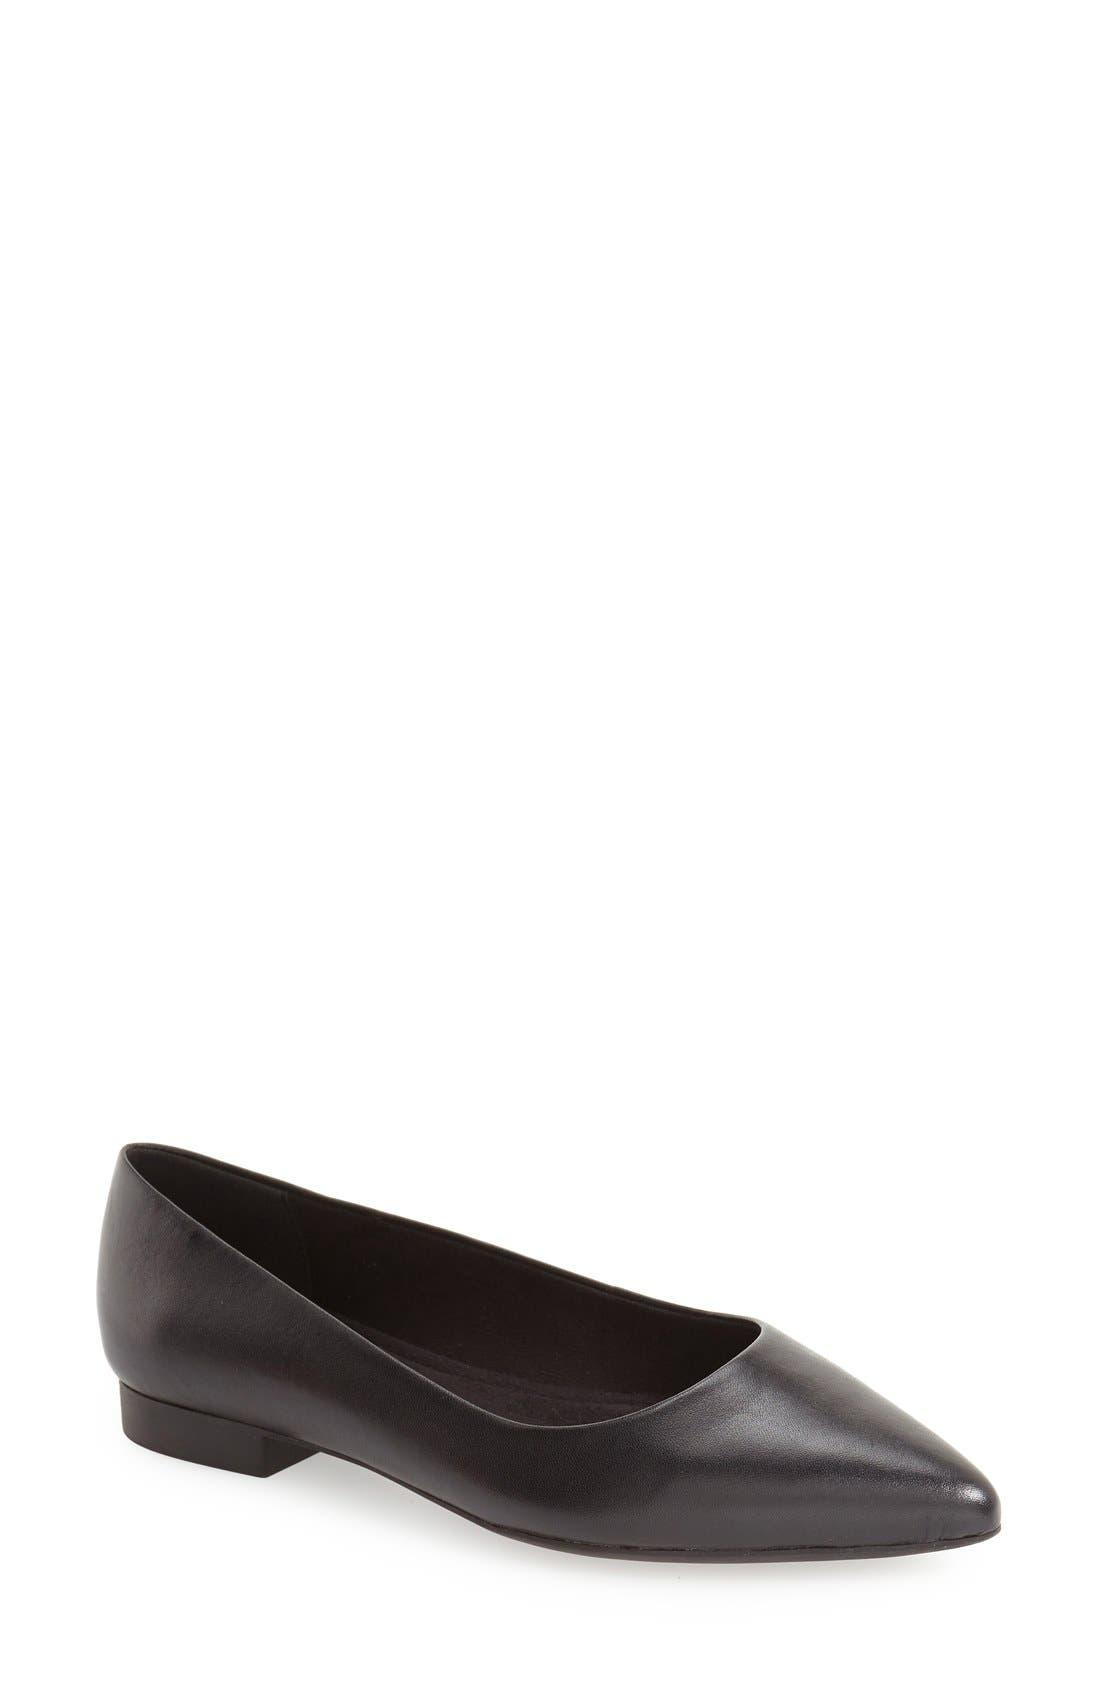 'Vivien' Pointy Toe Flat,                         Main,                         color, Black Leather